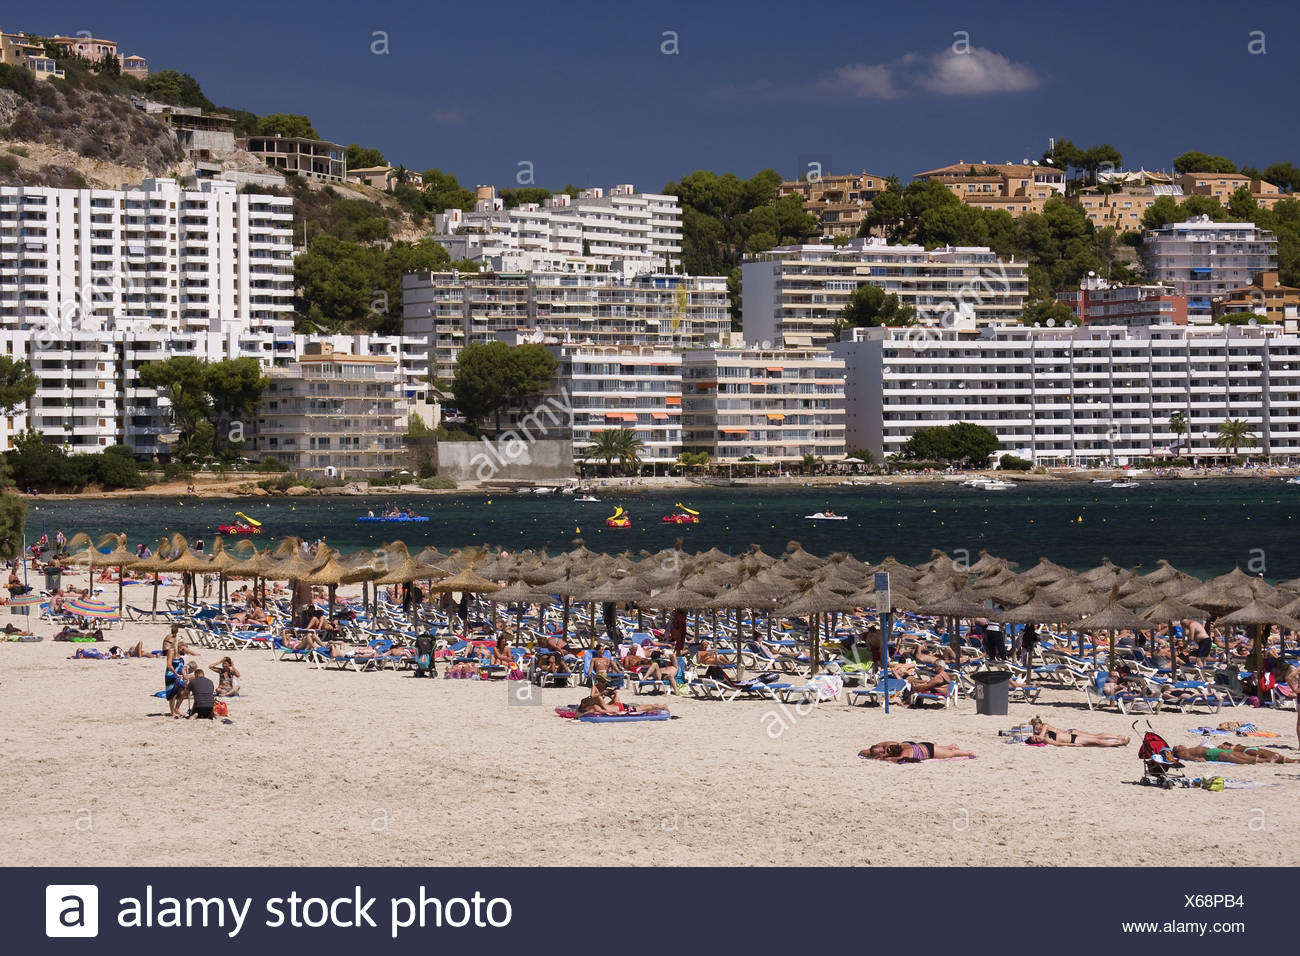 Sandy beach of Santa Ponsa, Majorca, Balearic isla - Stock Image